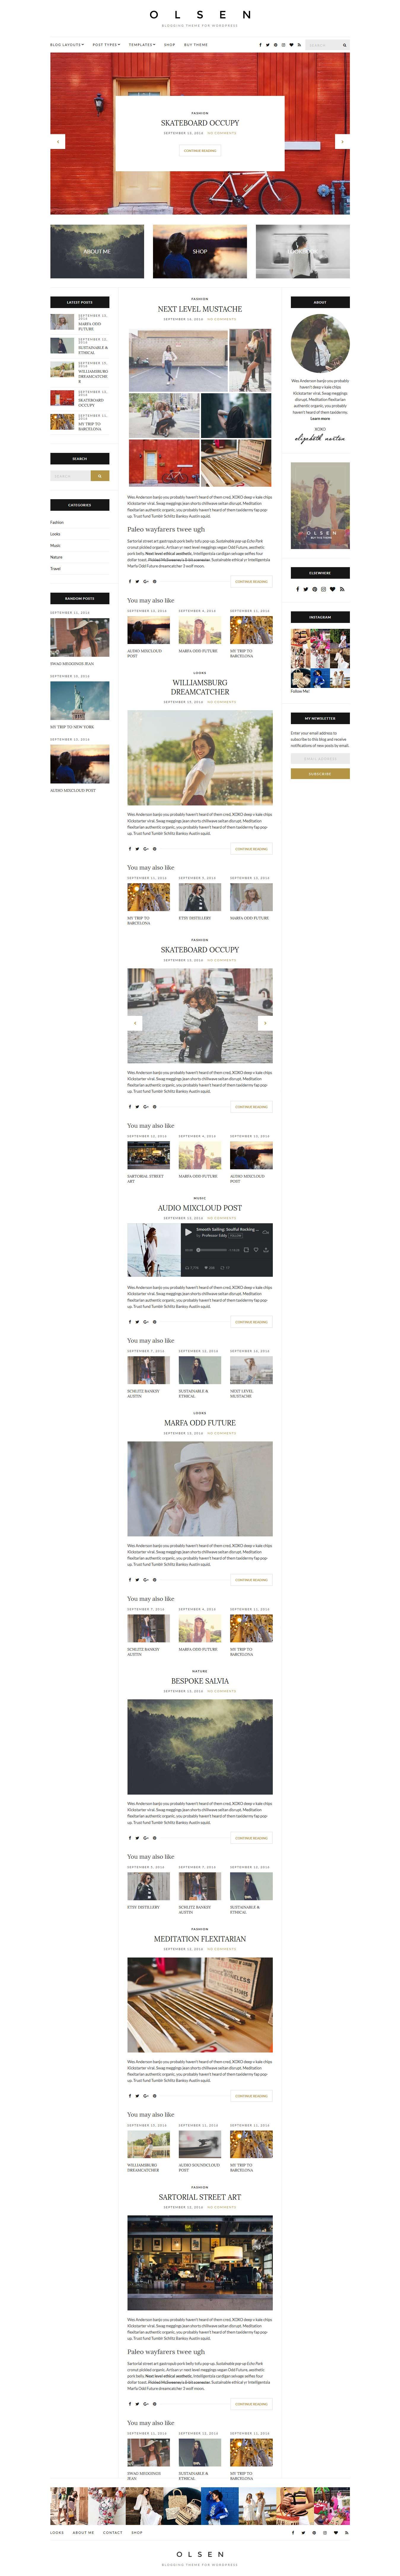 Olsen - Best Premium Responsive WordPress Themes